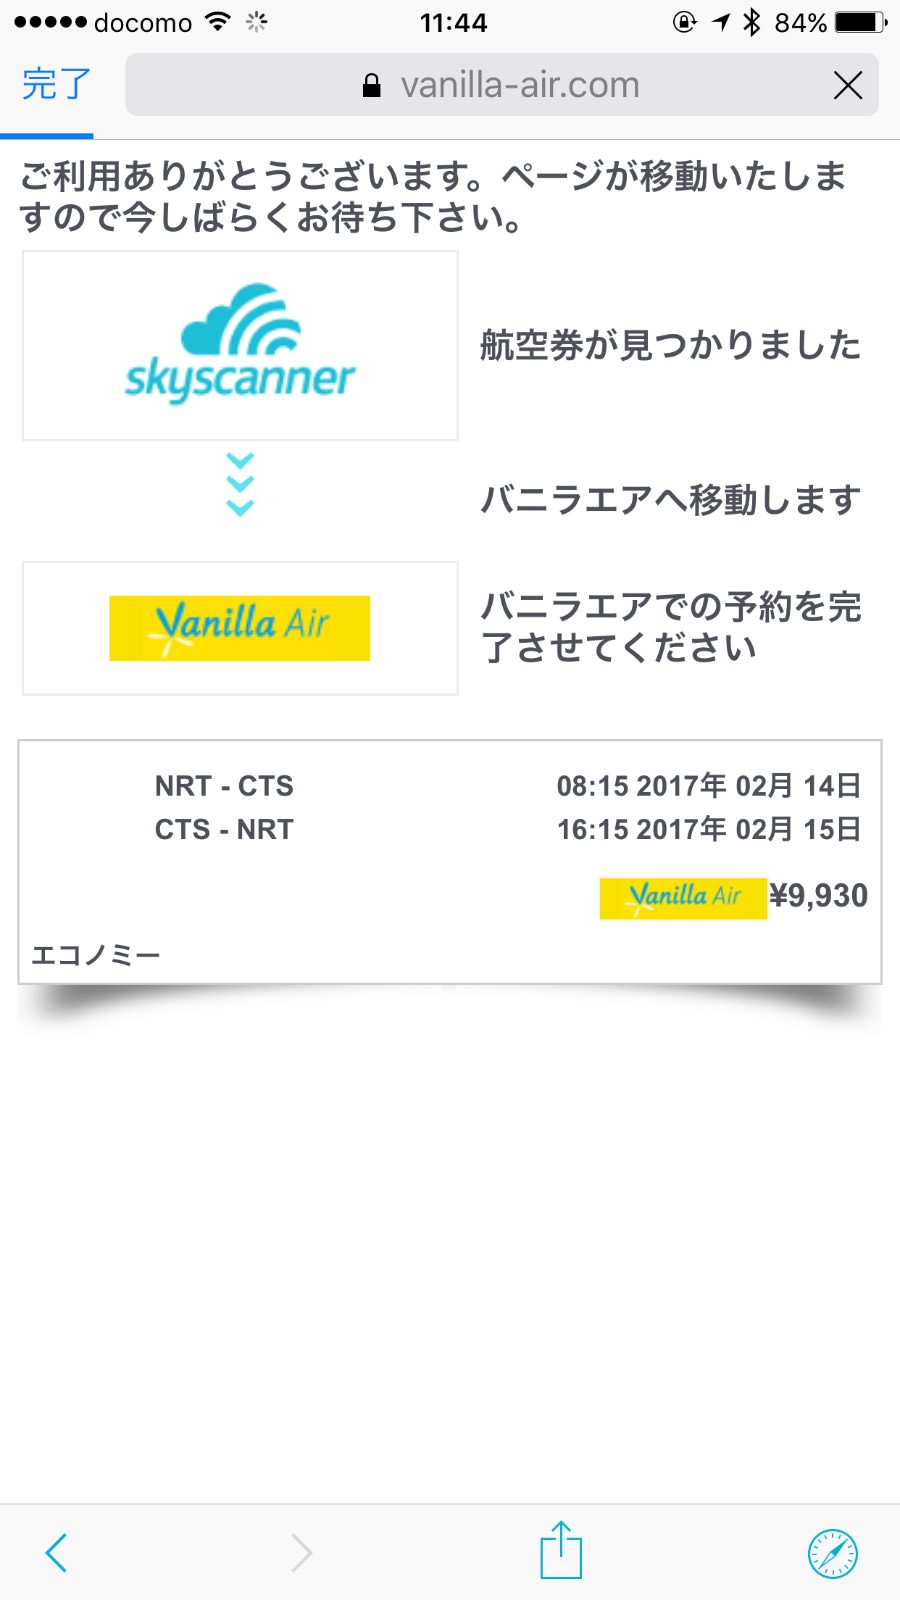 Skyscanner 4439